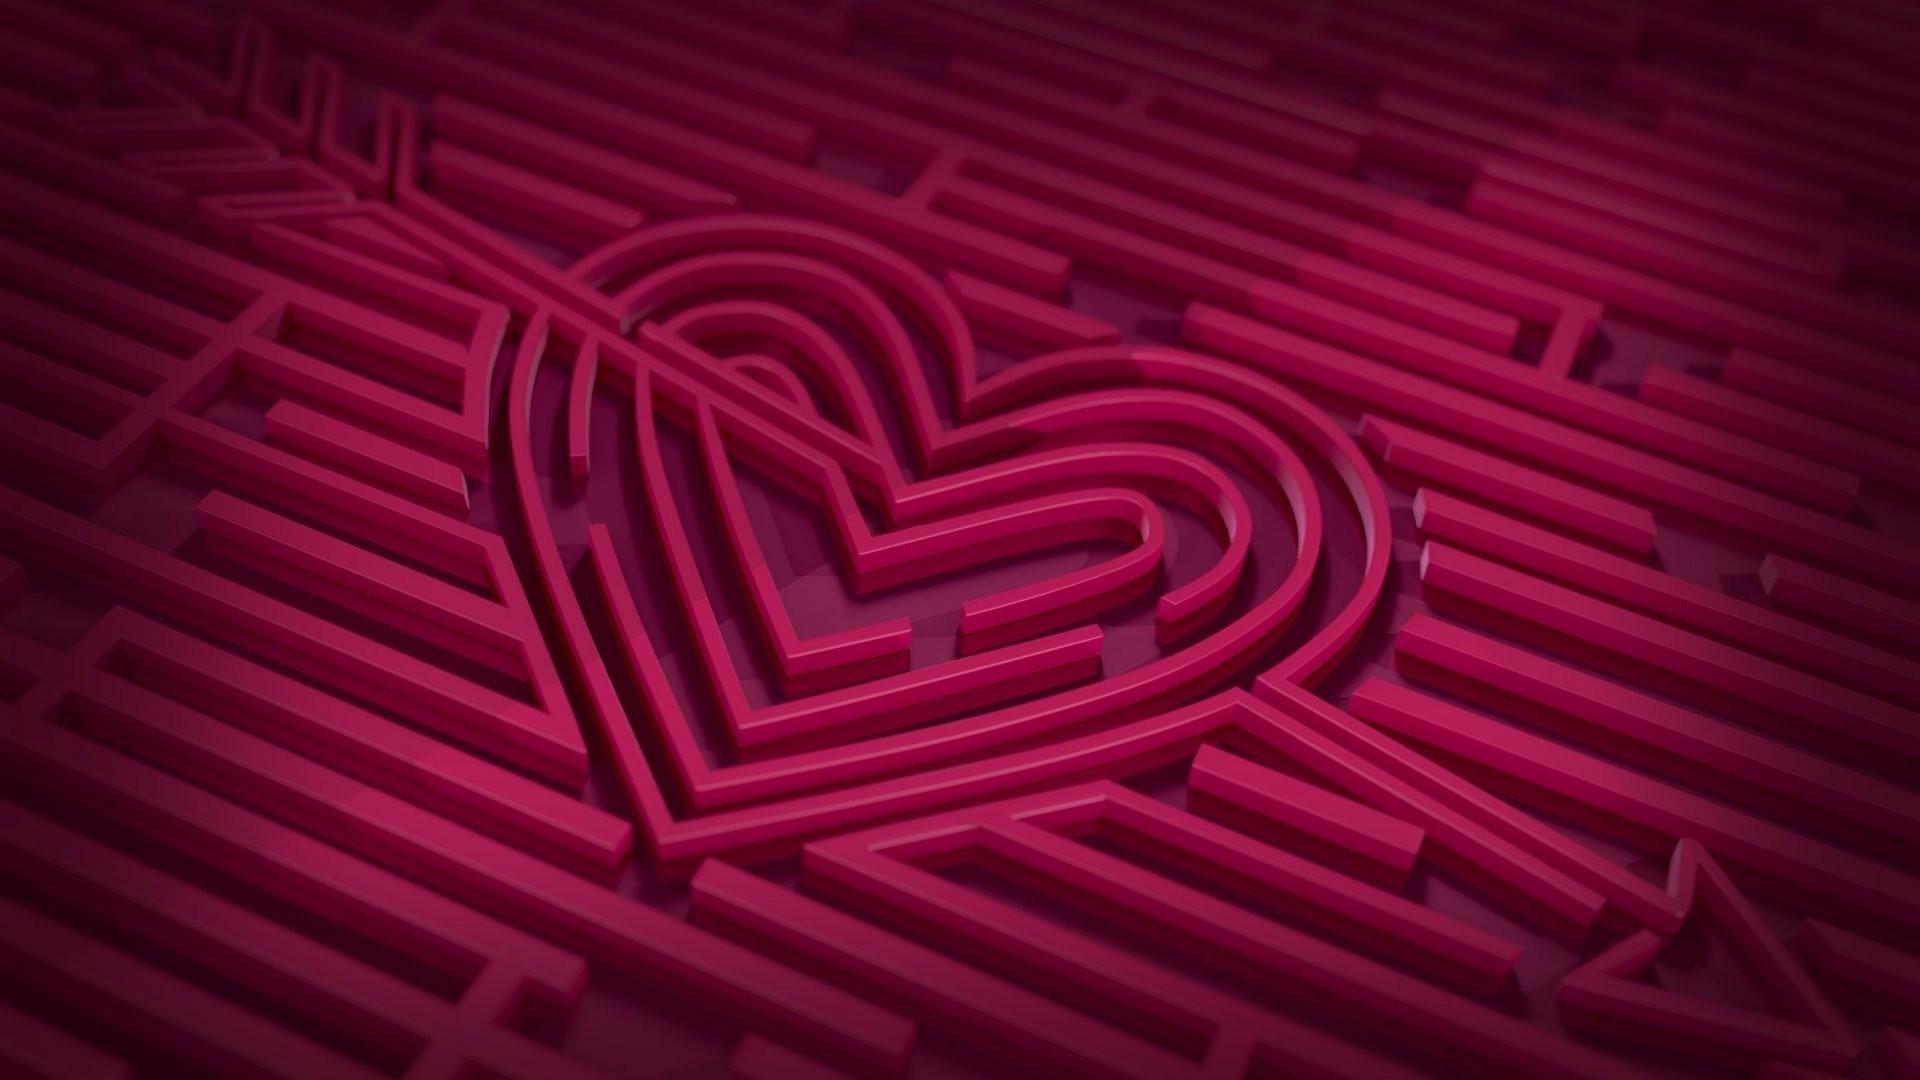 Res: 1920x1080, Cool love heart HD wallpaper.